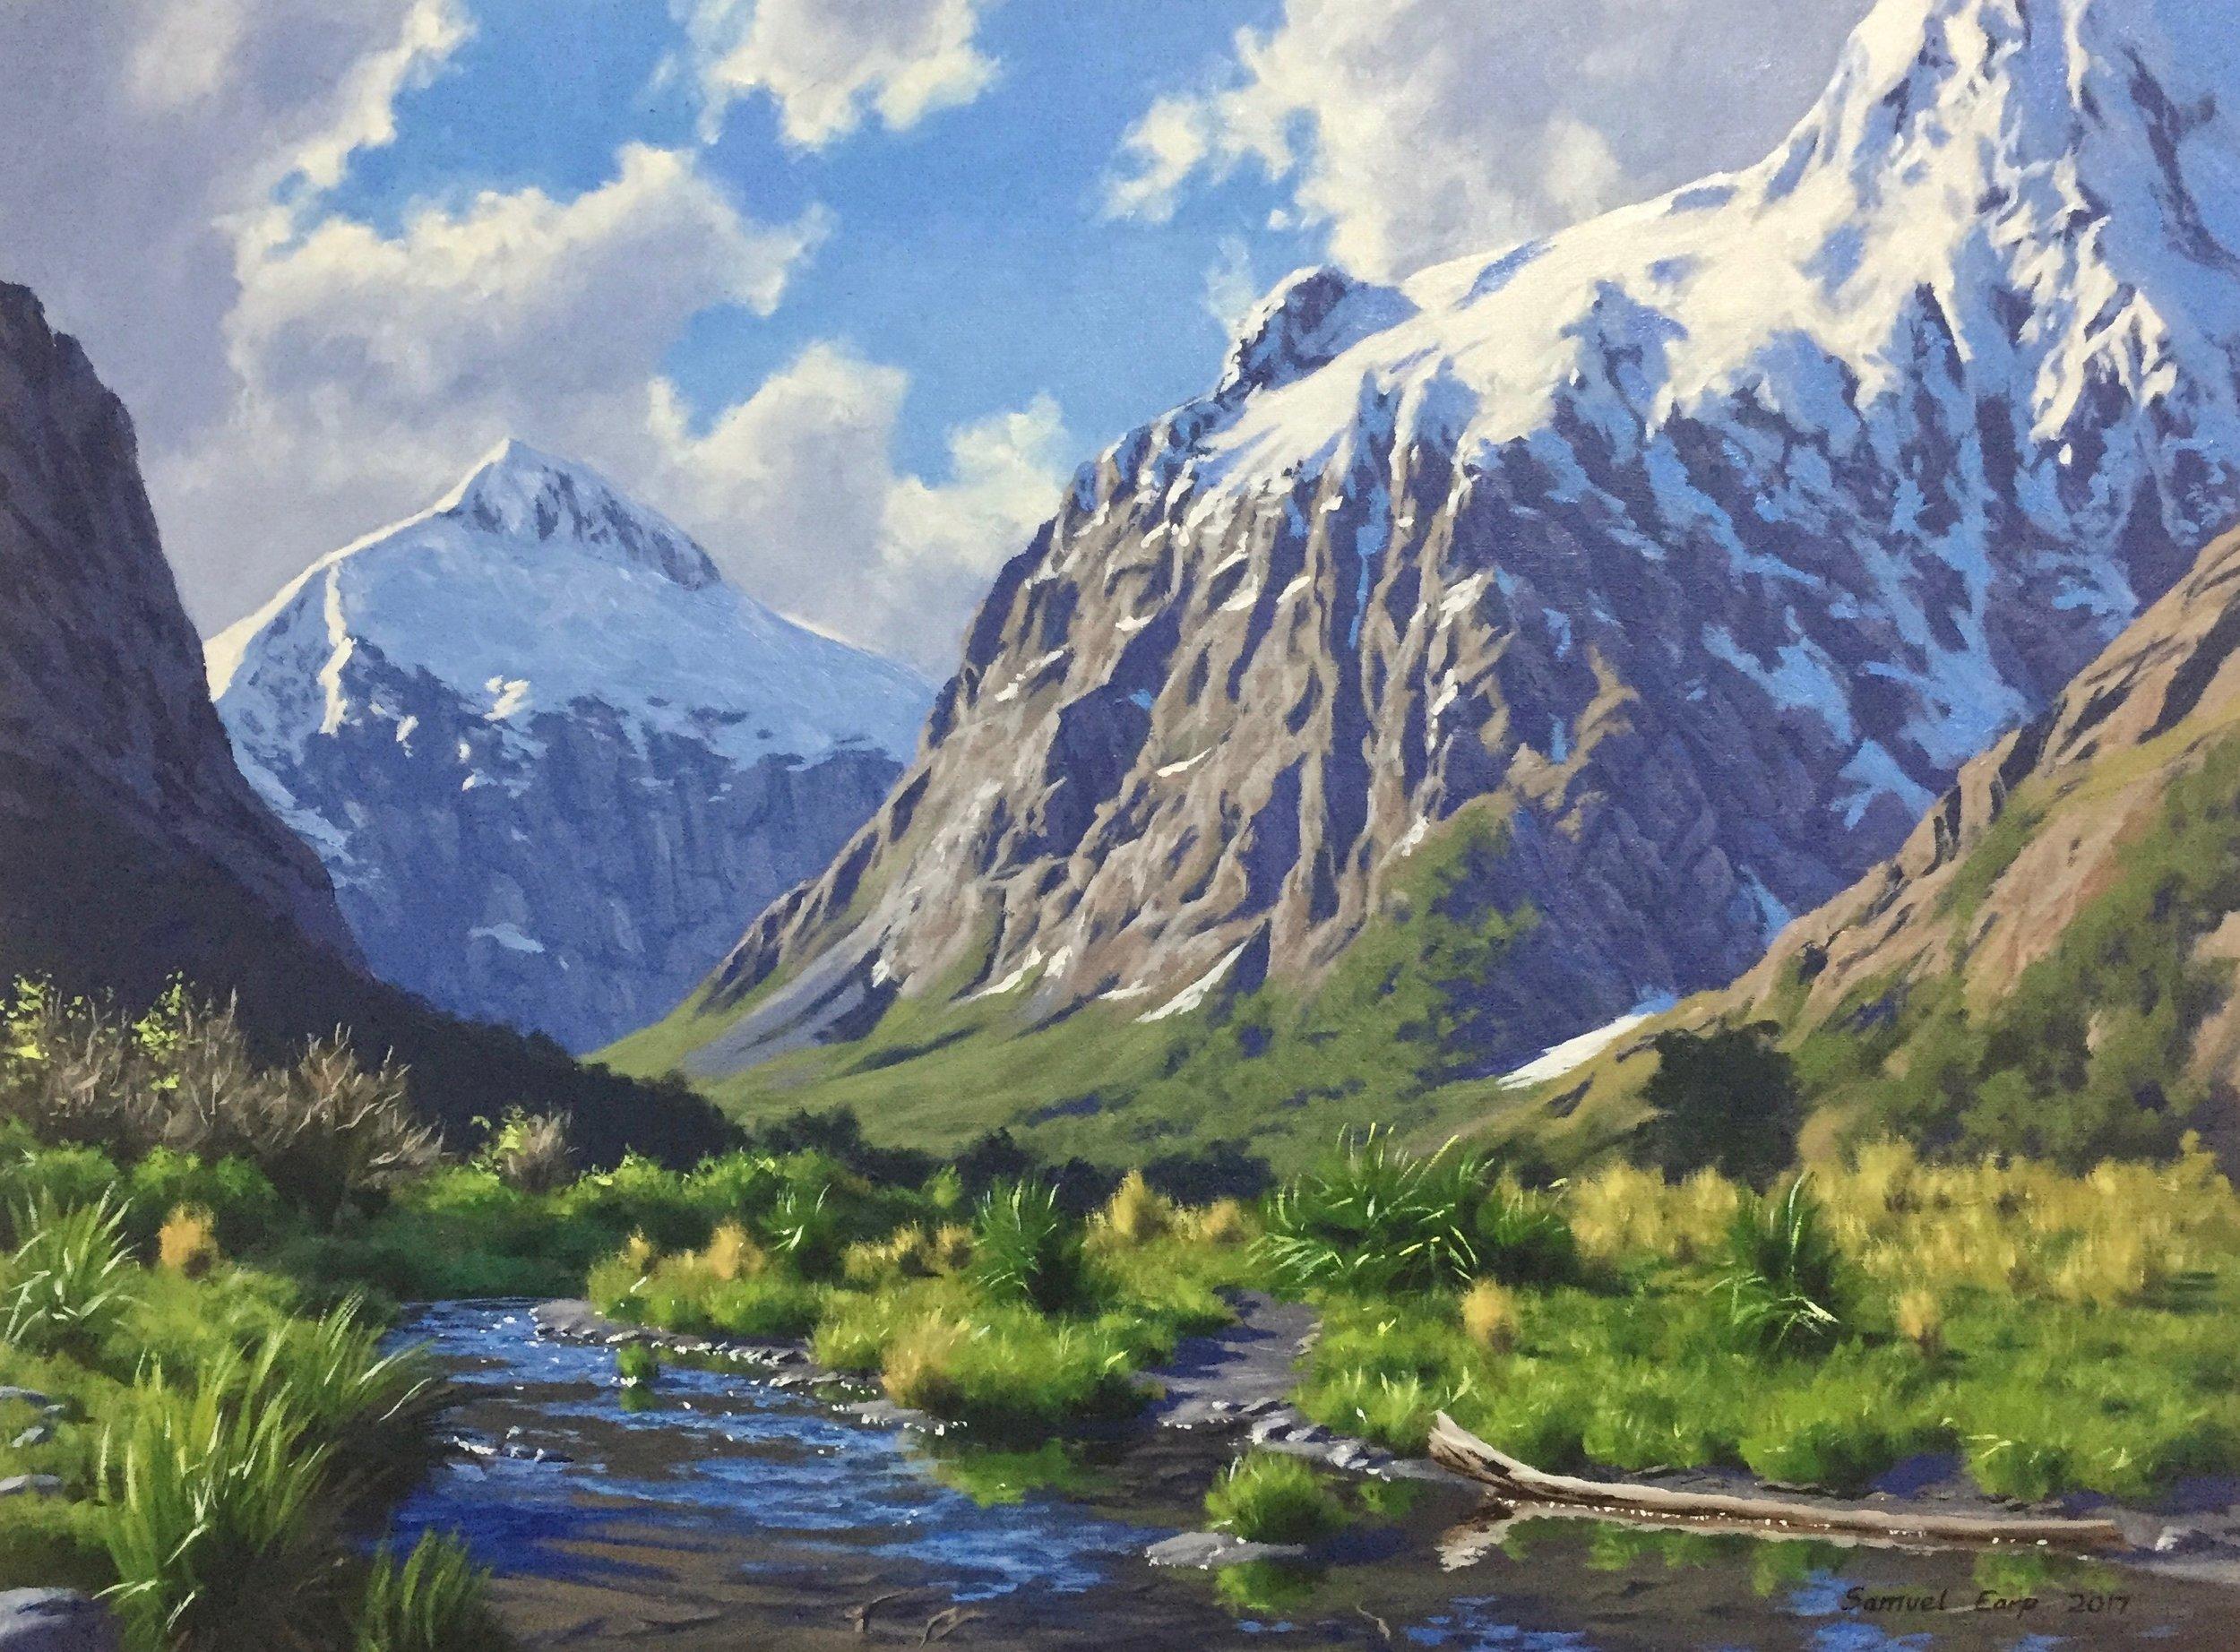 Mt Talbot and Mt Crosscut - Samuel Earp landscape artist.jpg